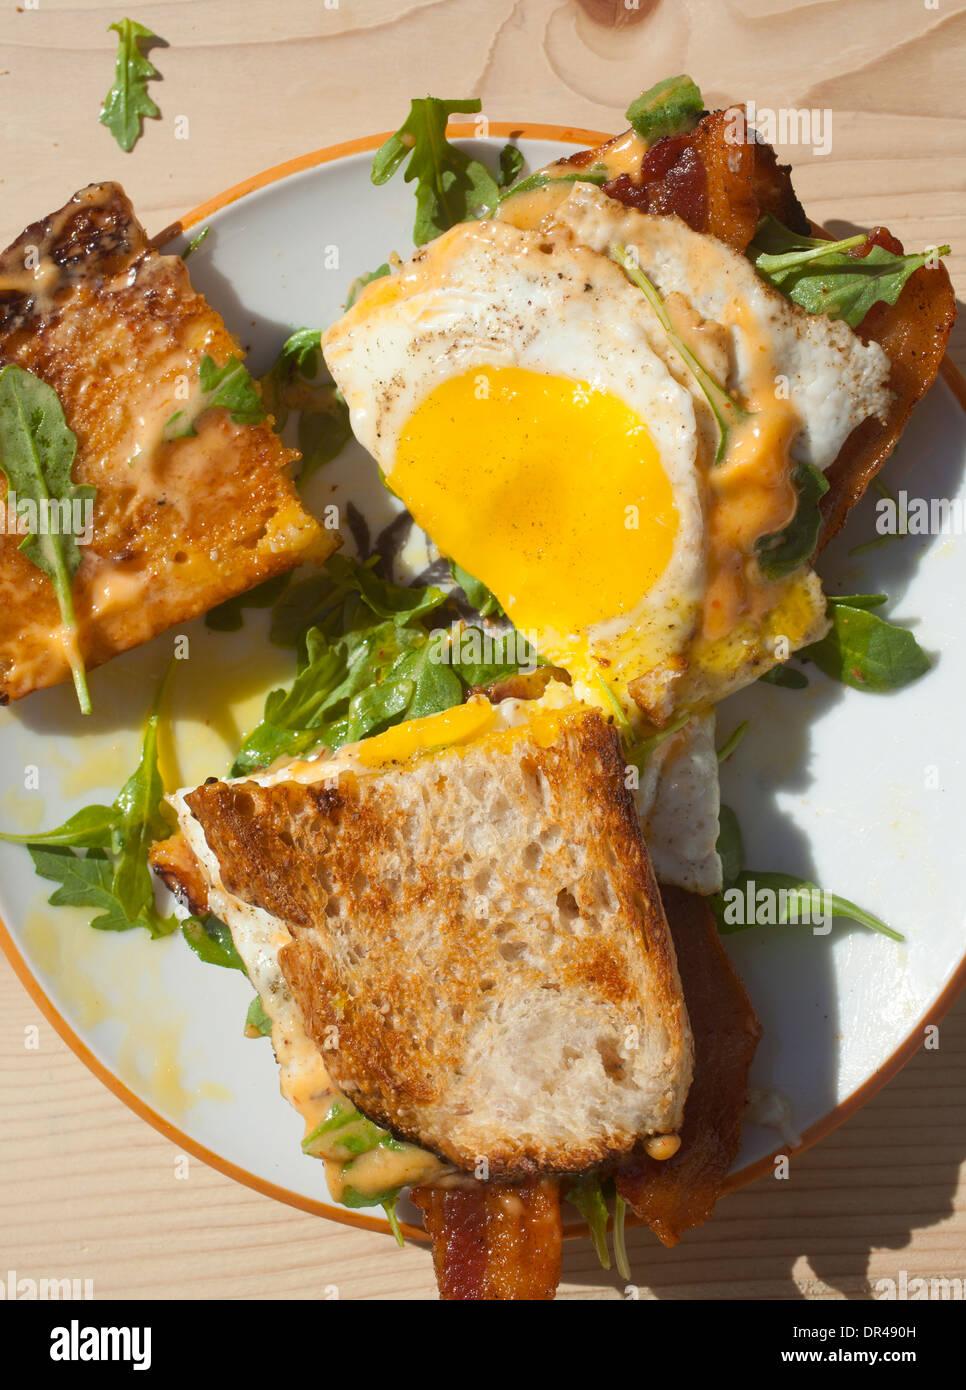 Breakfast sandwich de huevo Imagen De Stock